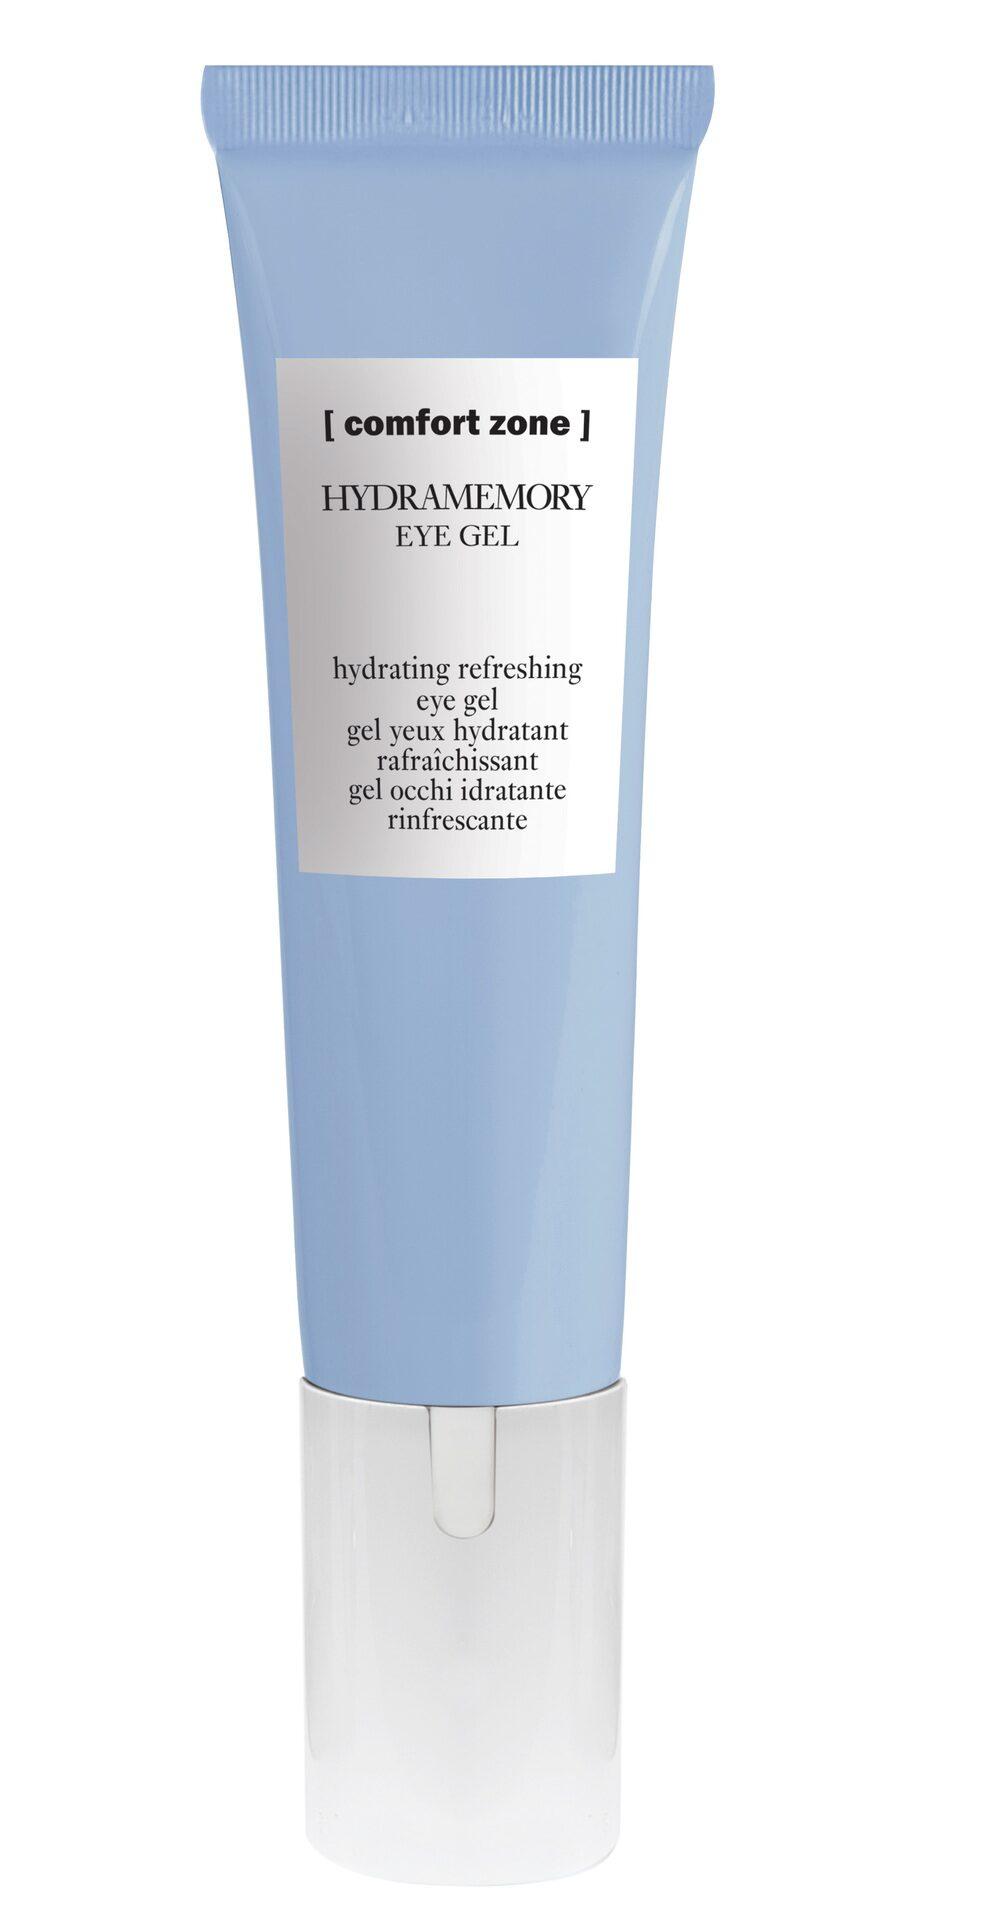 Hydramemory eye cream, 425 kr/15 ml, Comfort Zone